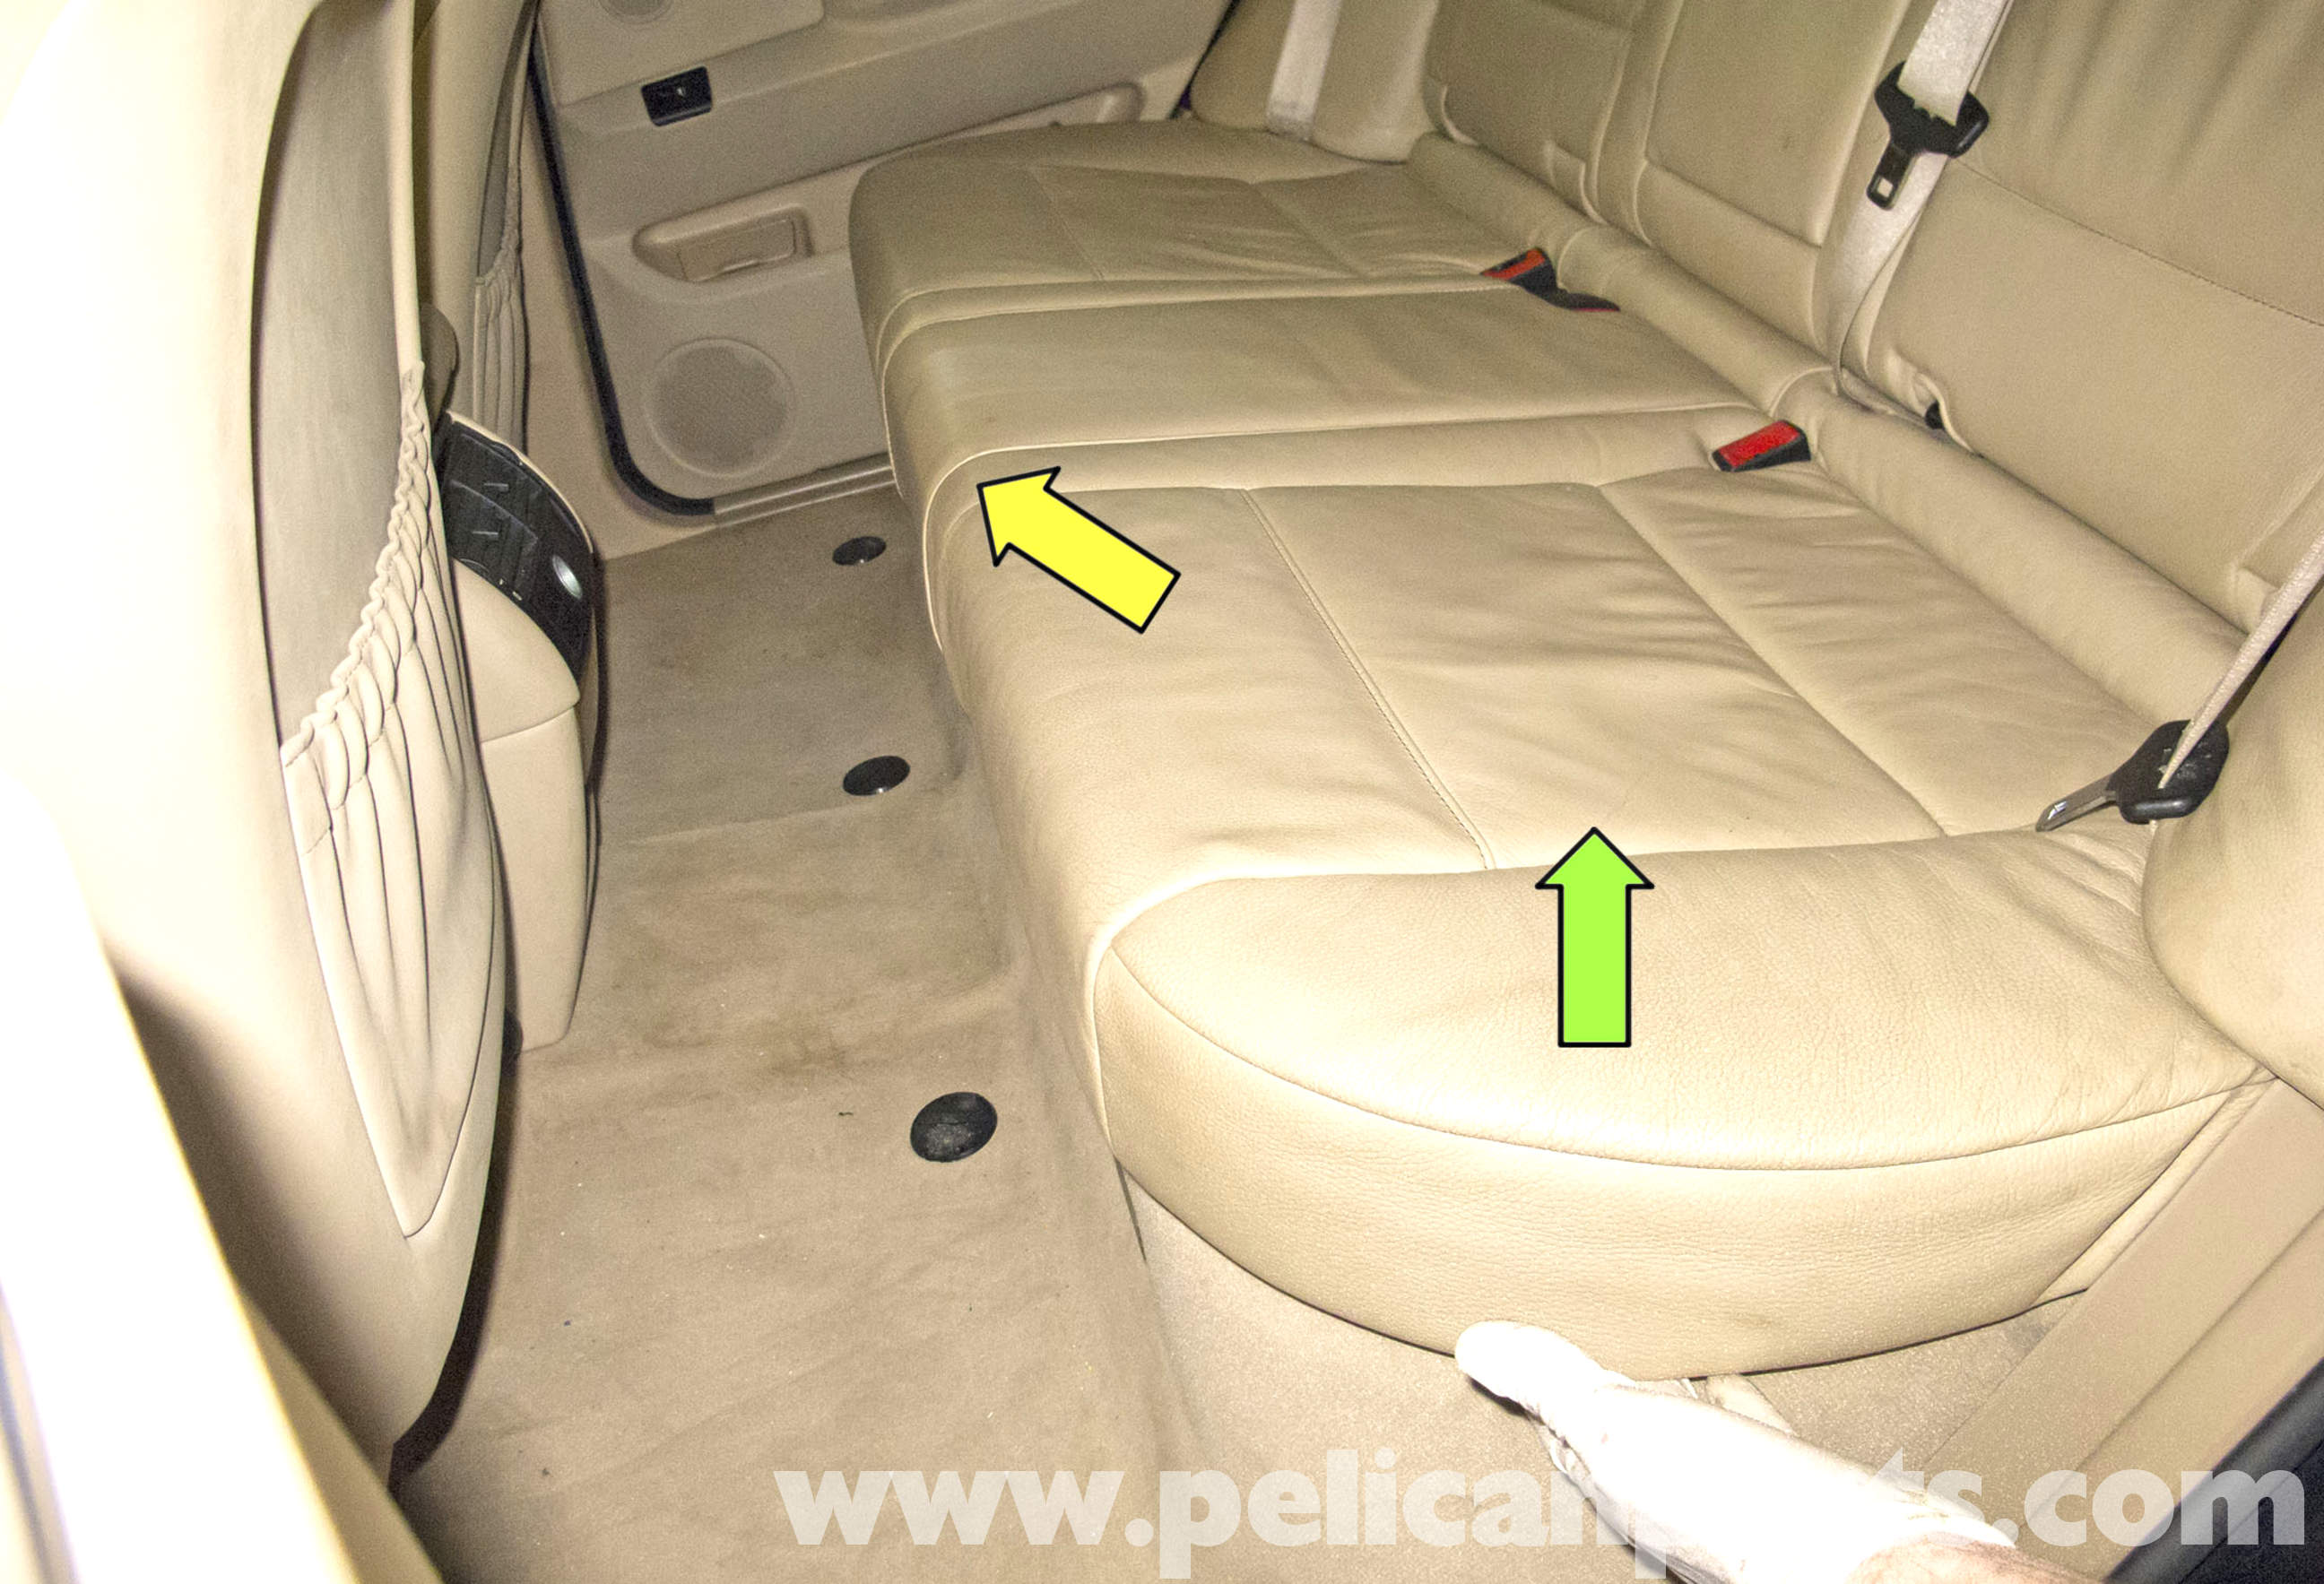 Bmw X5 Seat Replacement E53 2000 2006 Pelican Parts Diy Maintenance Article